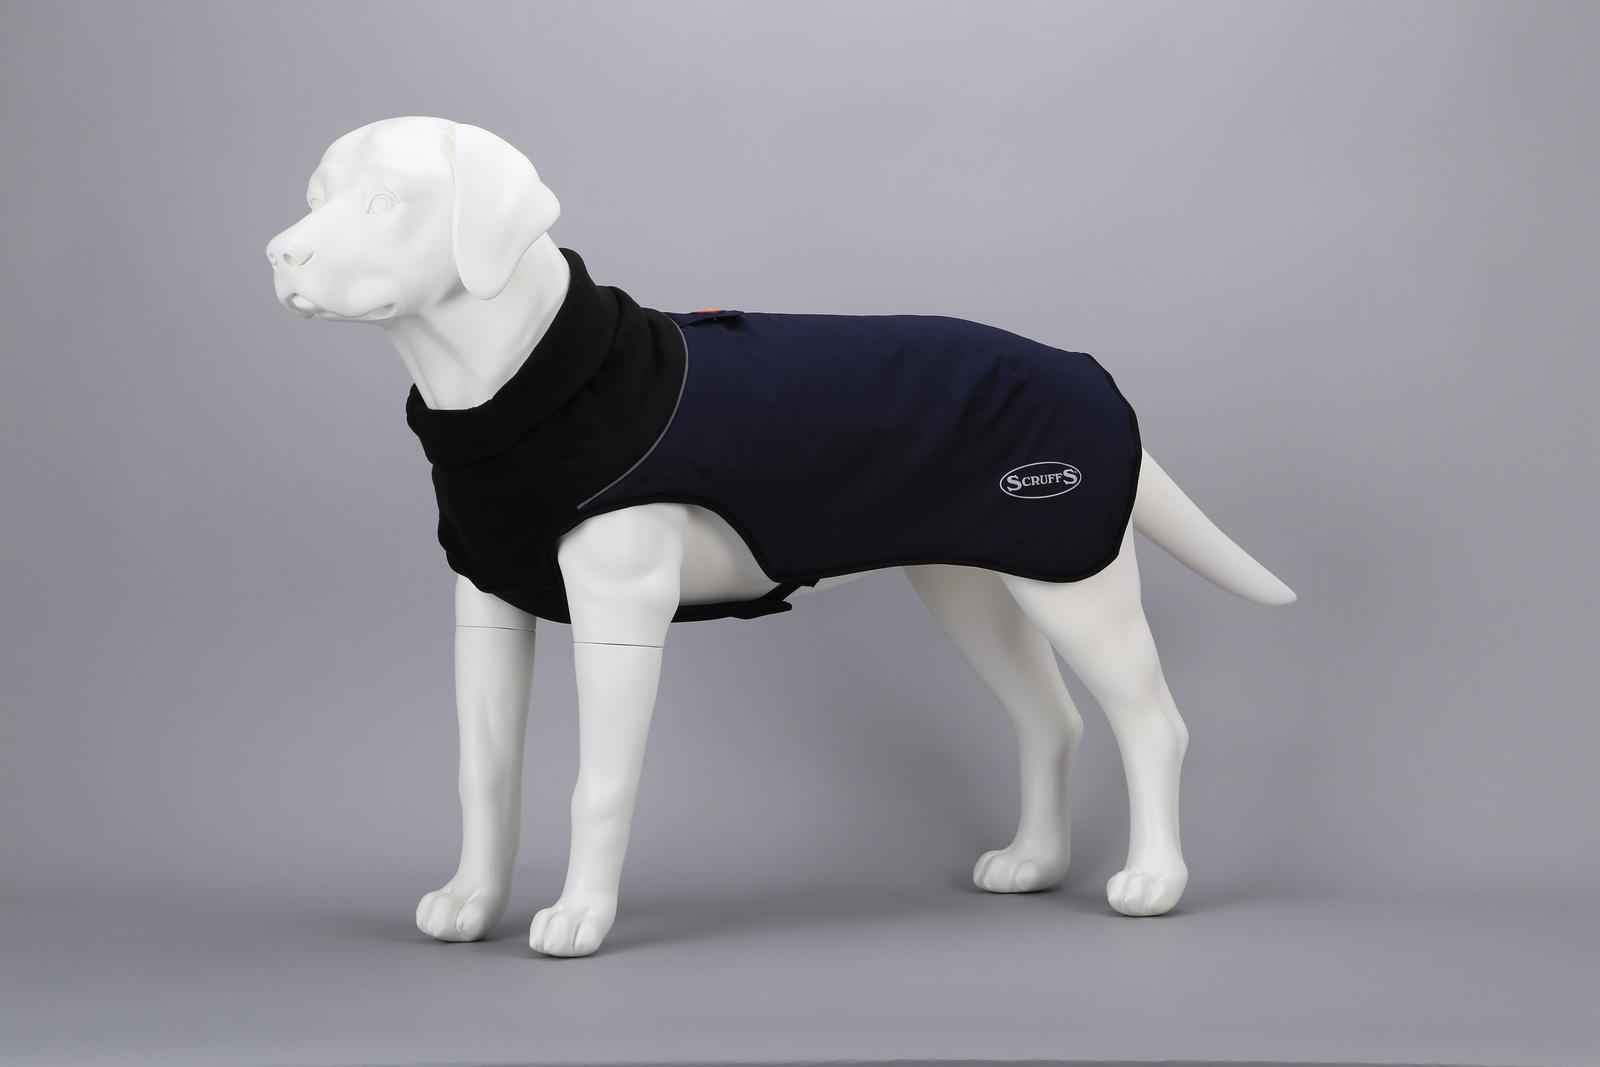 Одежда для собак SCRUFFS Thermal попона согревающая 936112, 50см, темно-синий